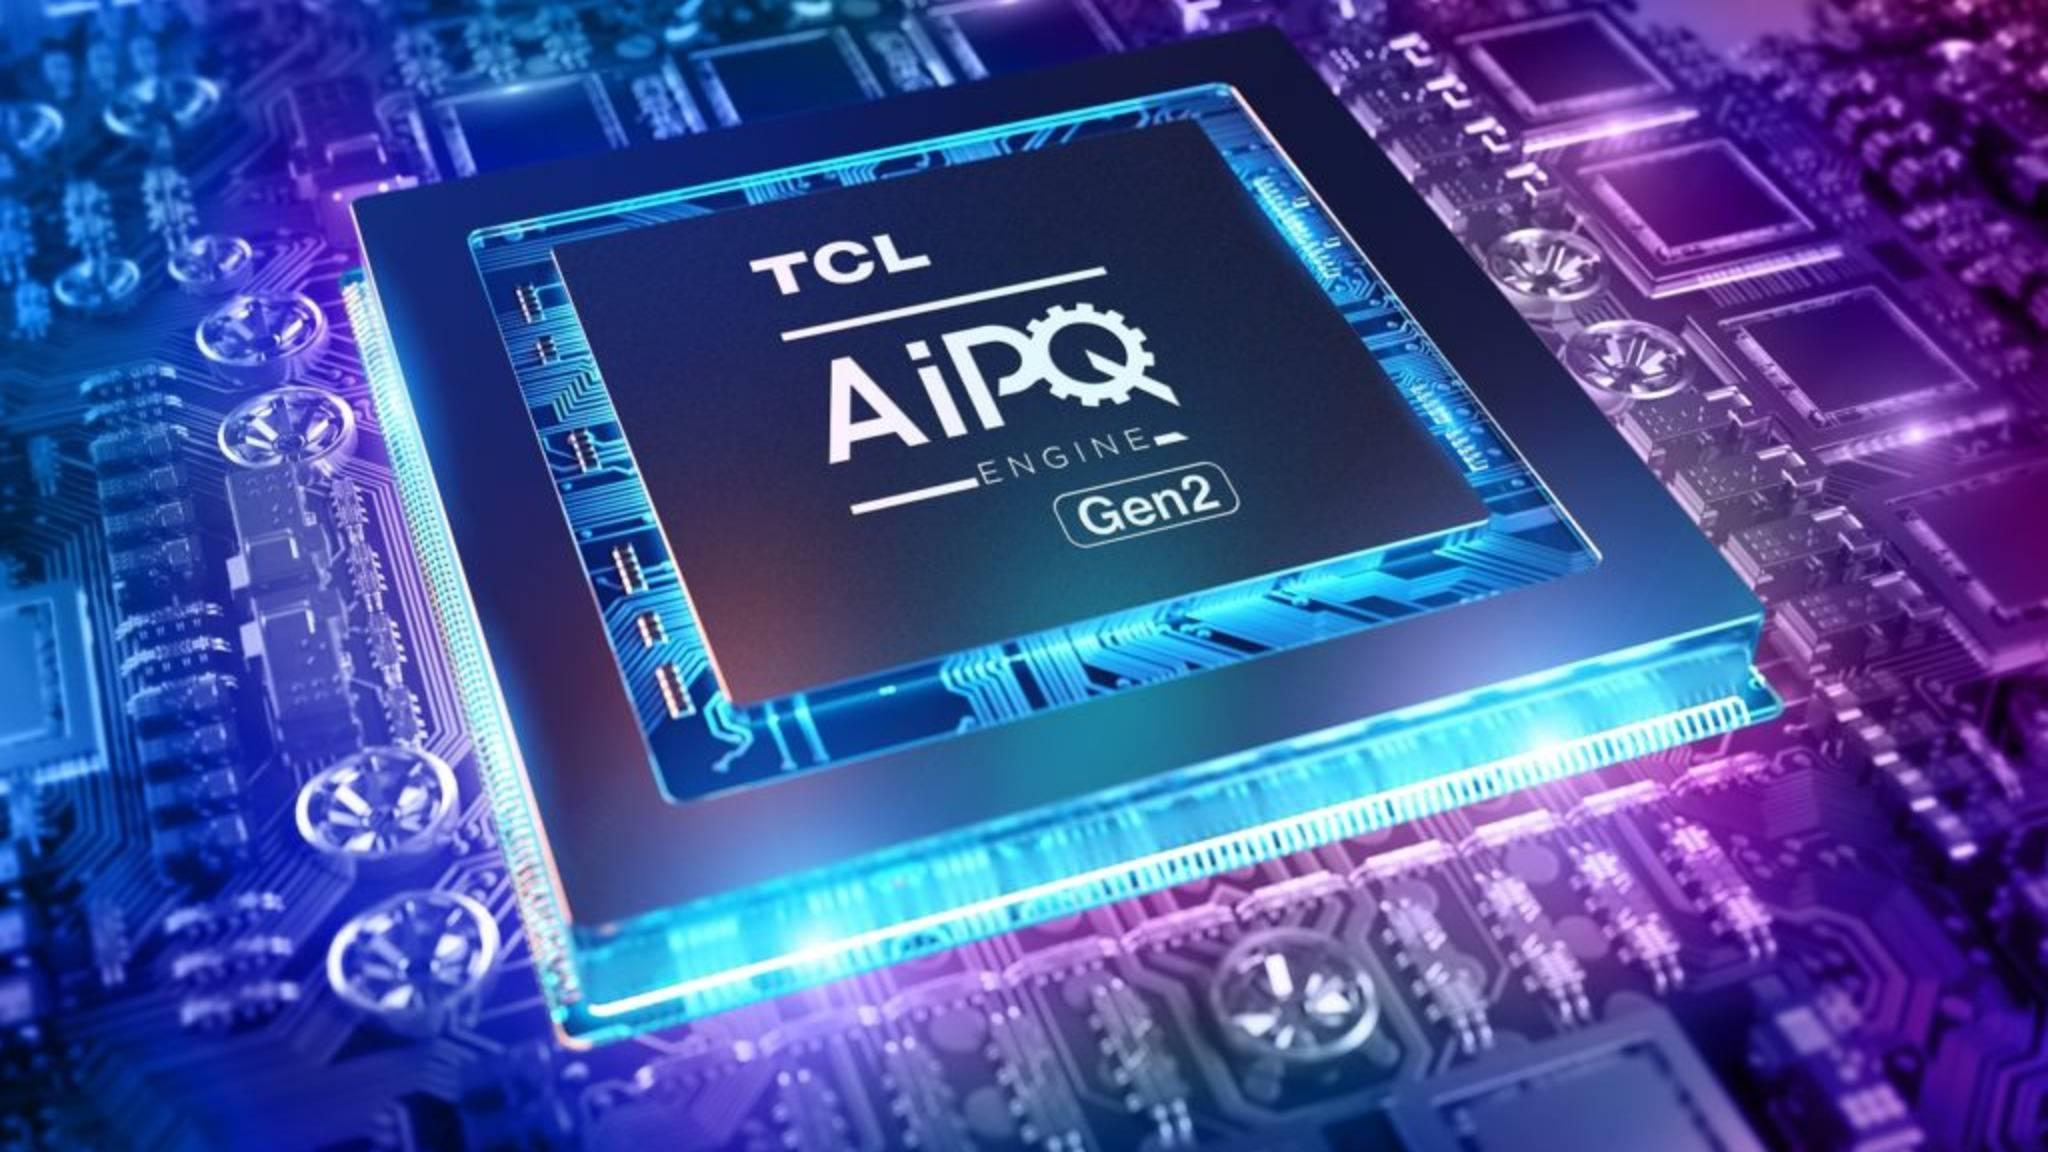 TCL-AIPQ-Engine-Gen2-TV-Fernseher-Bildprozessor